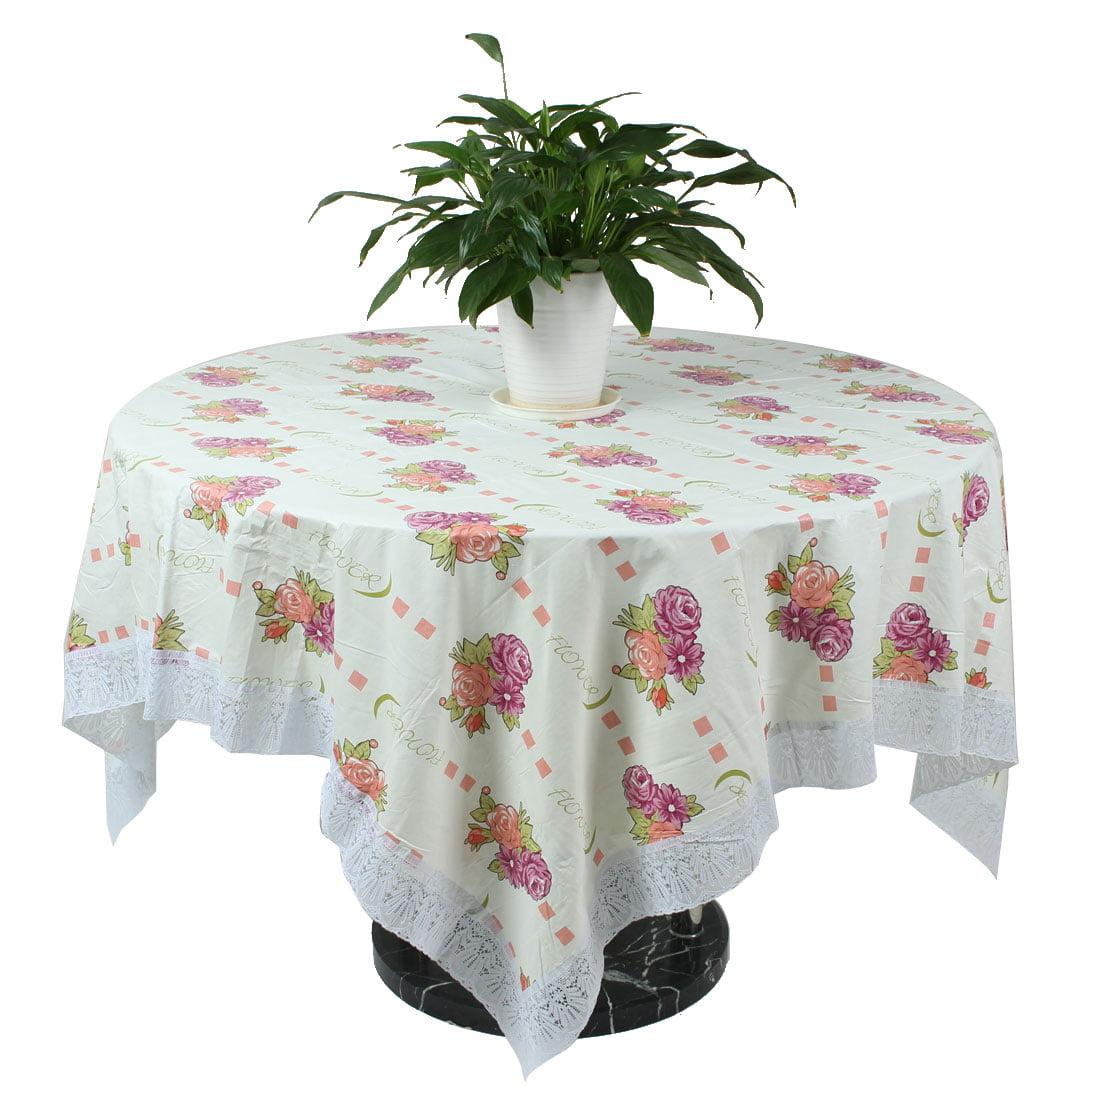 Unique Bargains Kitchen PVC Flower Pattern Rectangle Tabletop Protector  Tablecloth 13 x 13cm